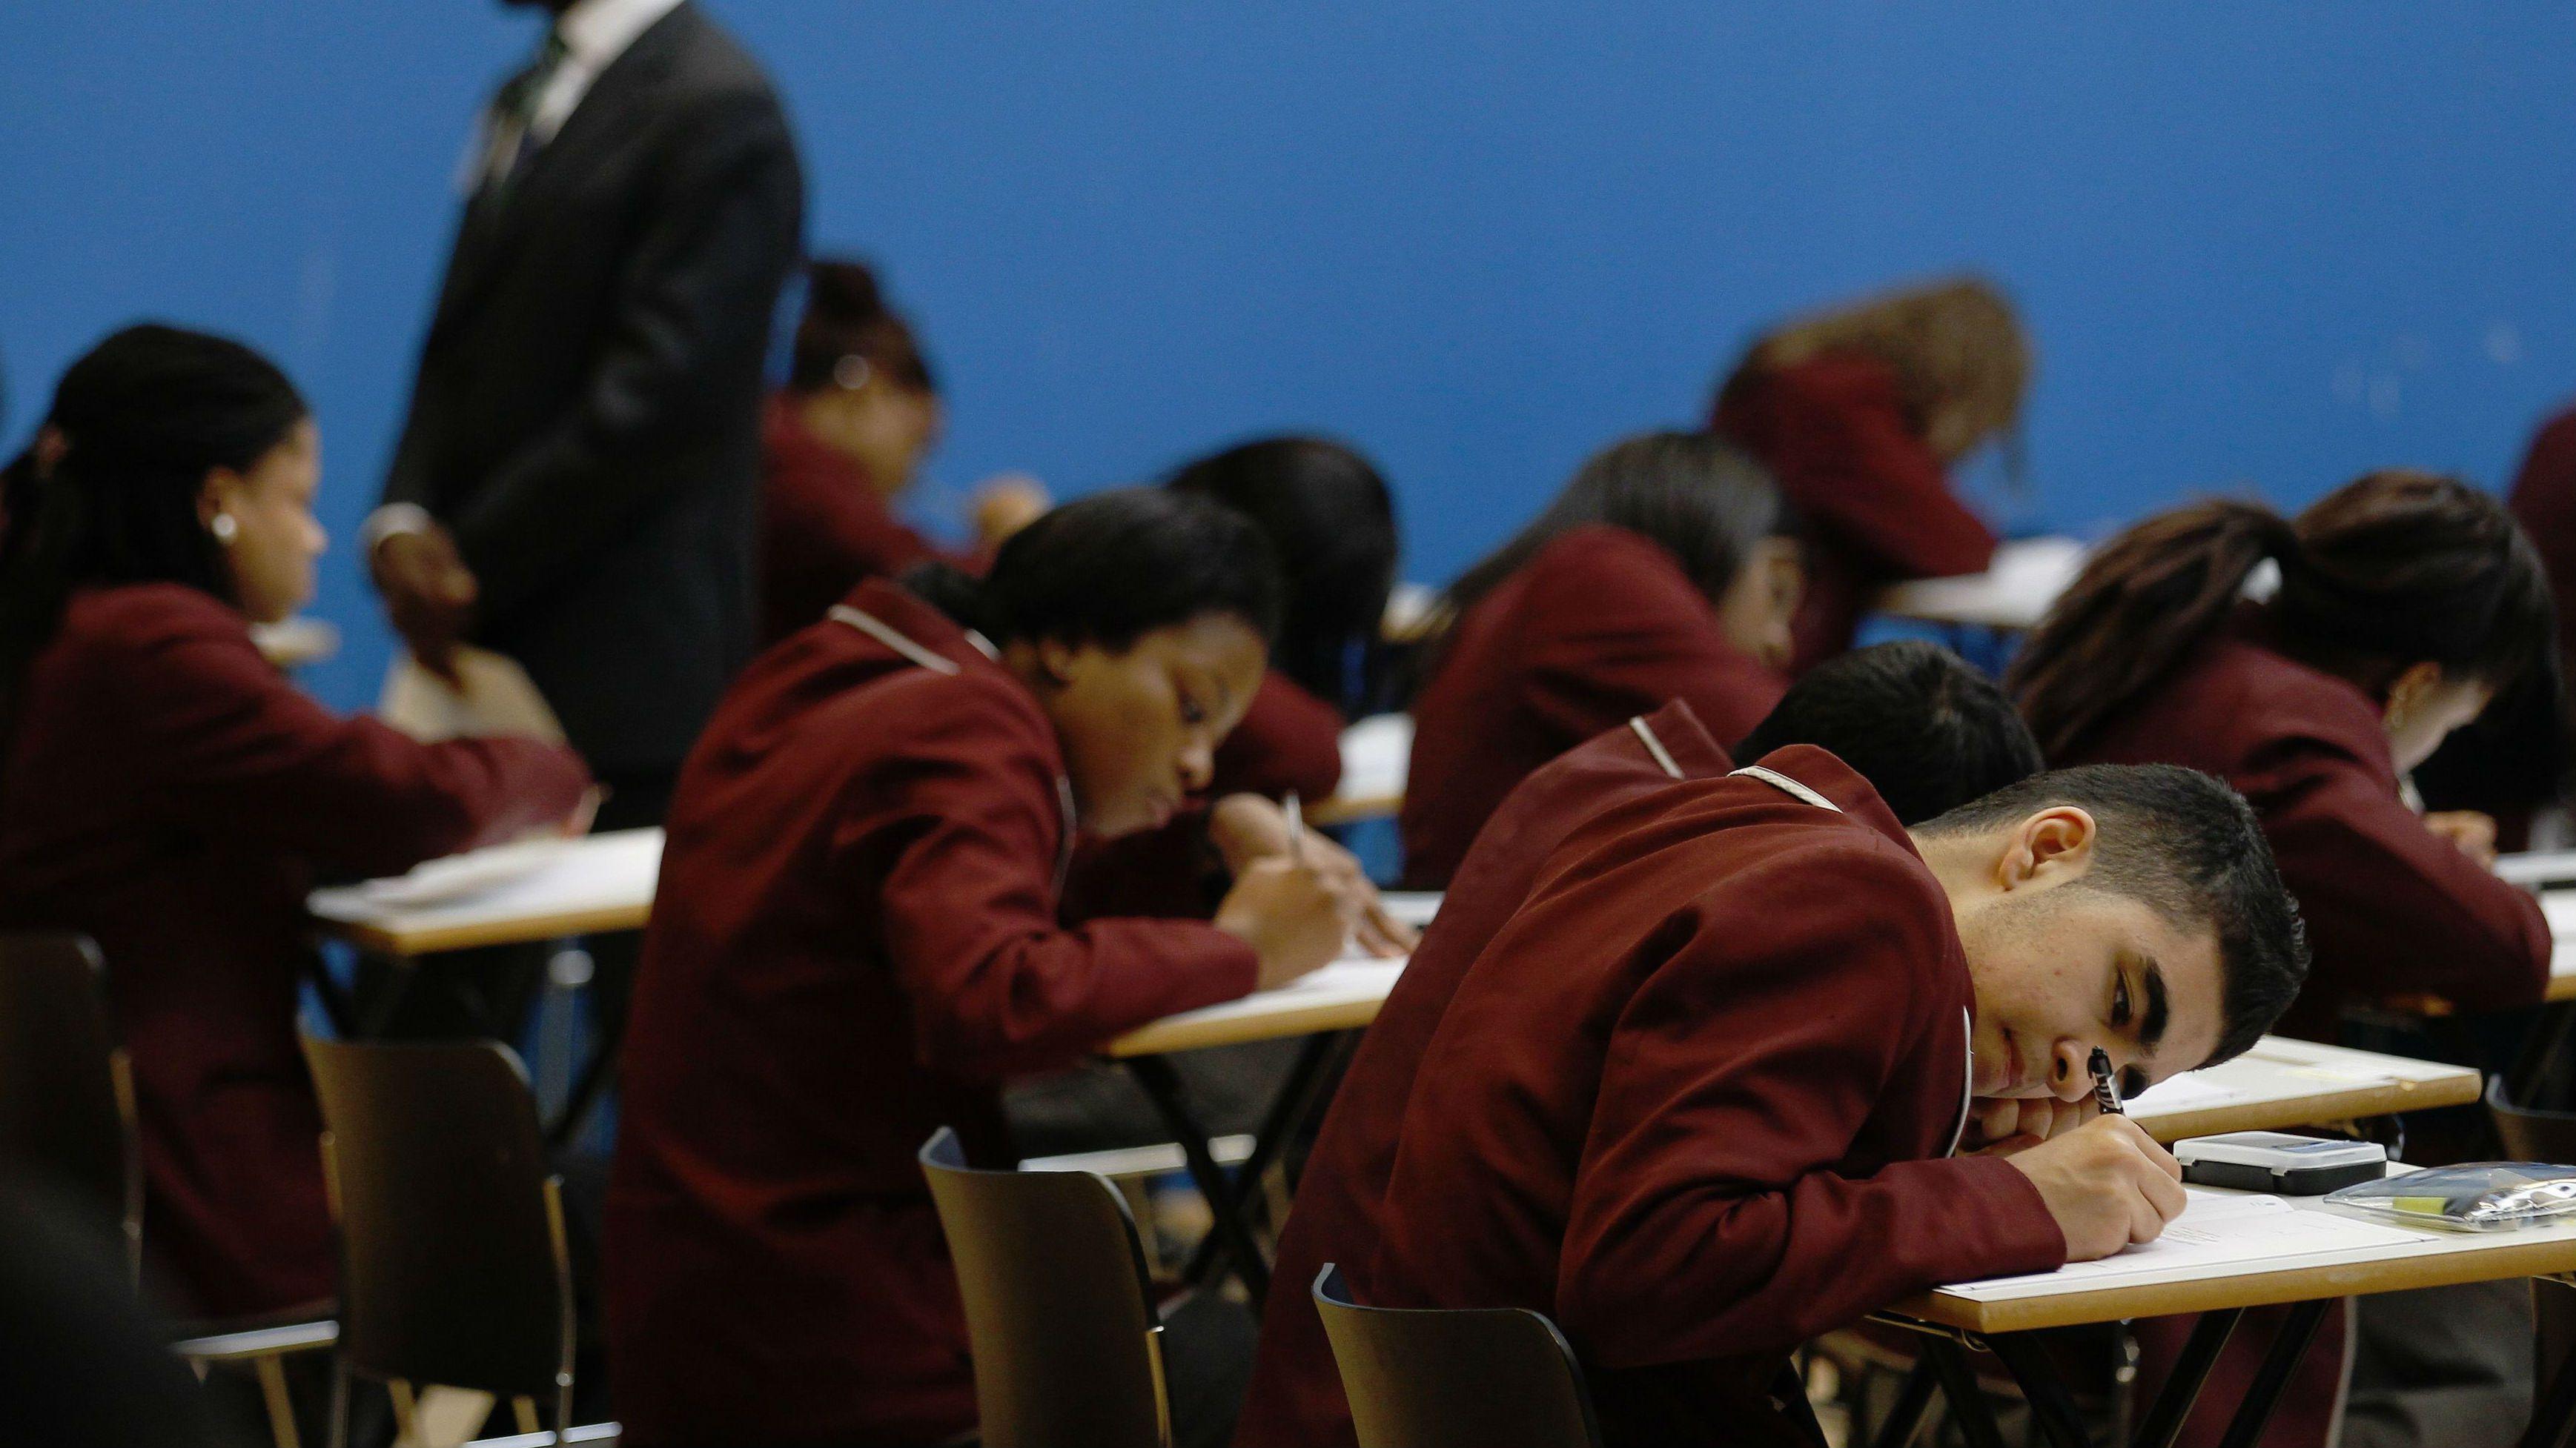 diversity in London schools